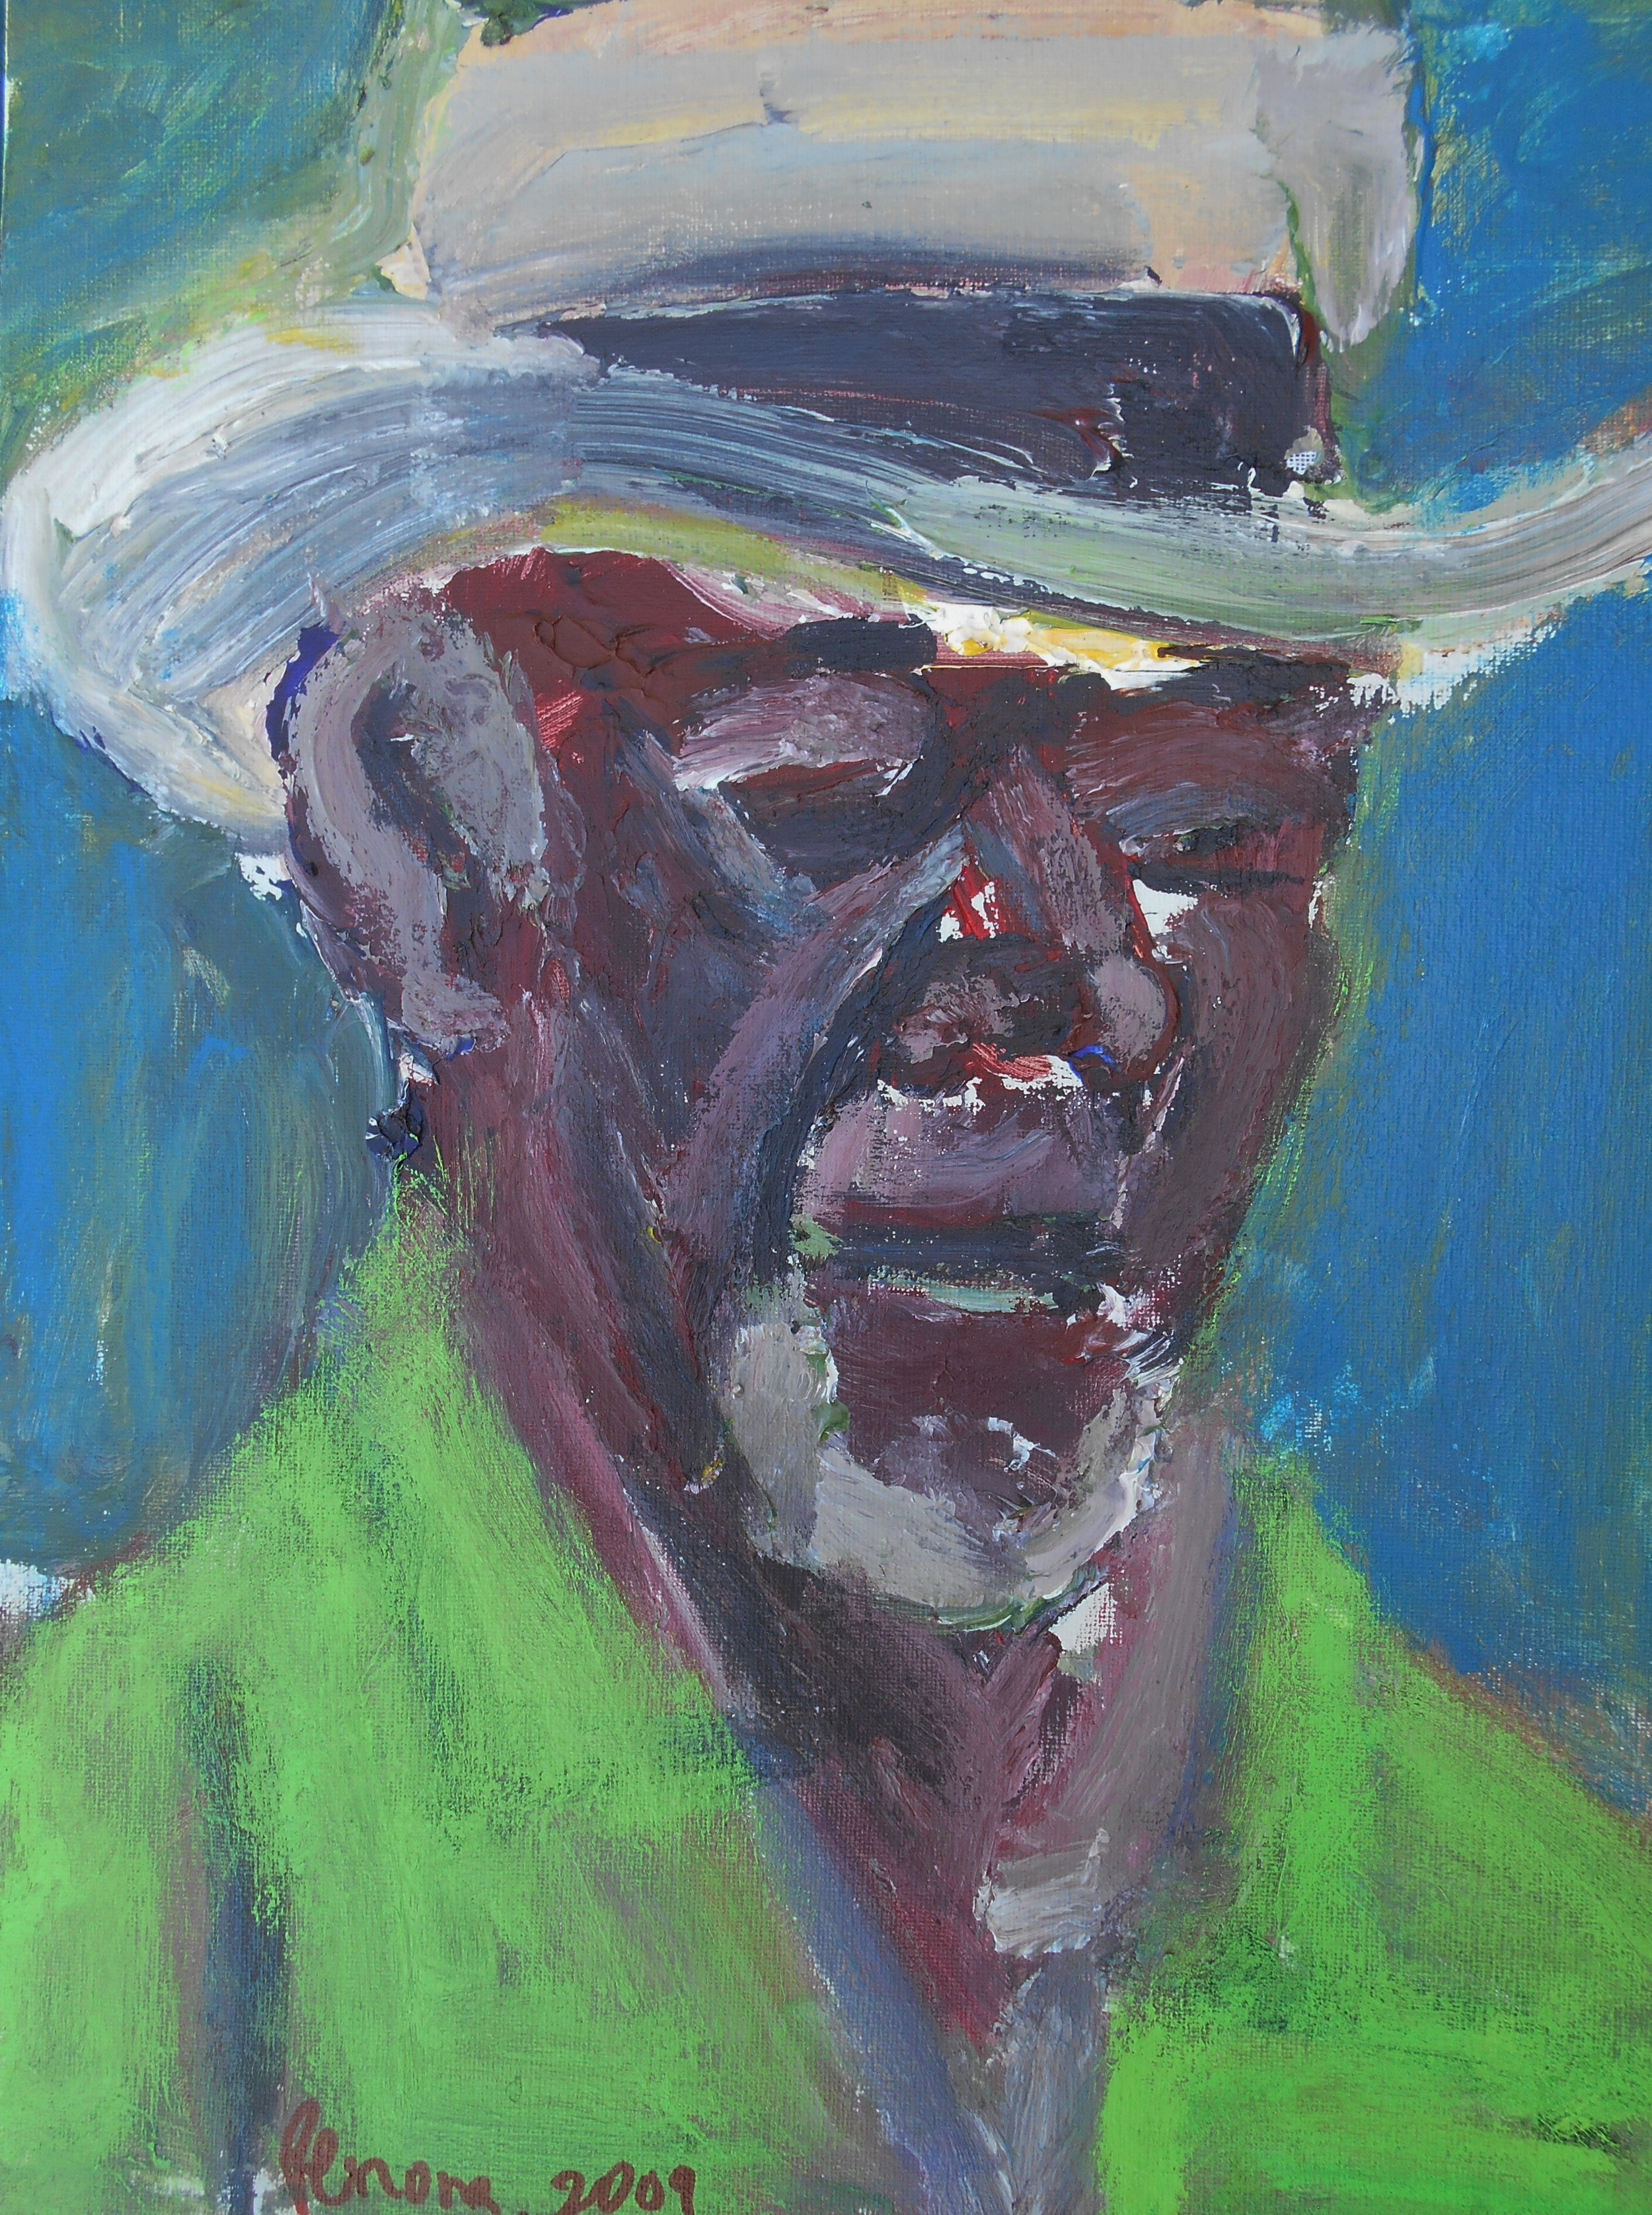 #5 Stephen Perrone - Roosevelt Dean - 2009 - 20x16 - a on c - $600.JPG